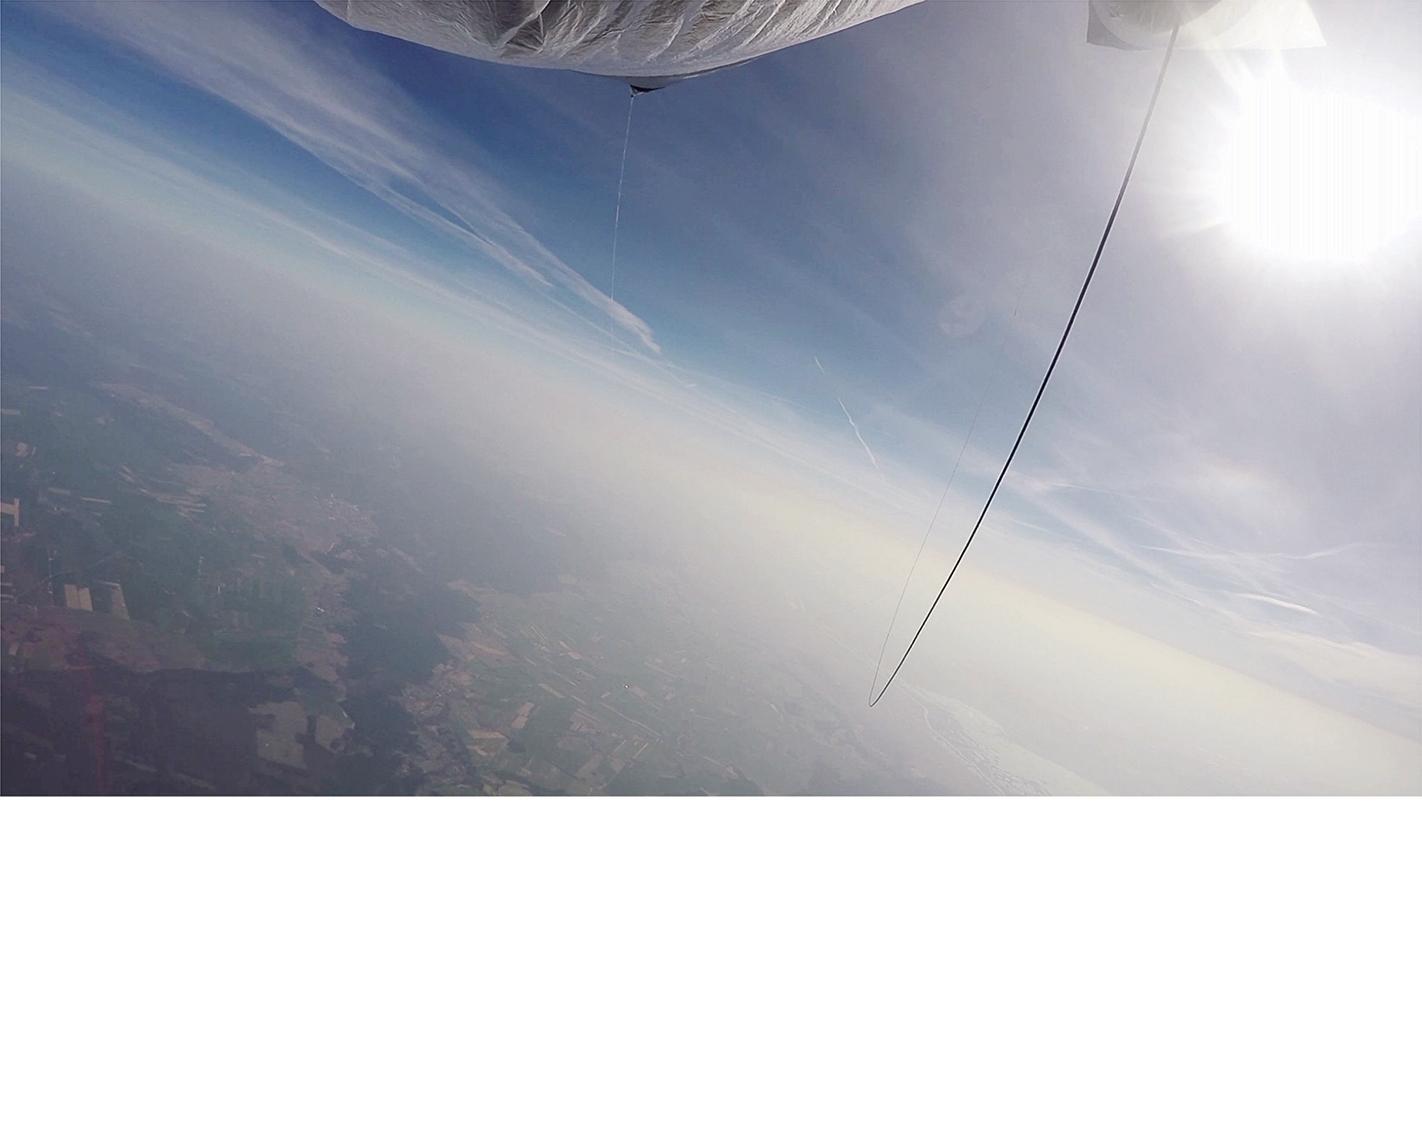 Tomas-Saraceno---Aerocene-V2-1500-V2.jpg